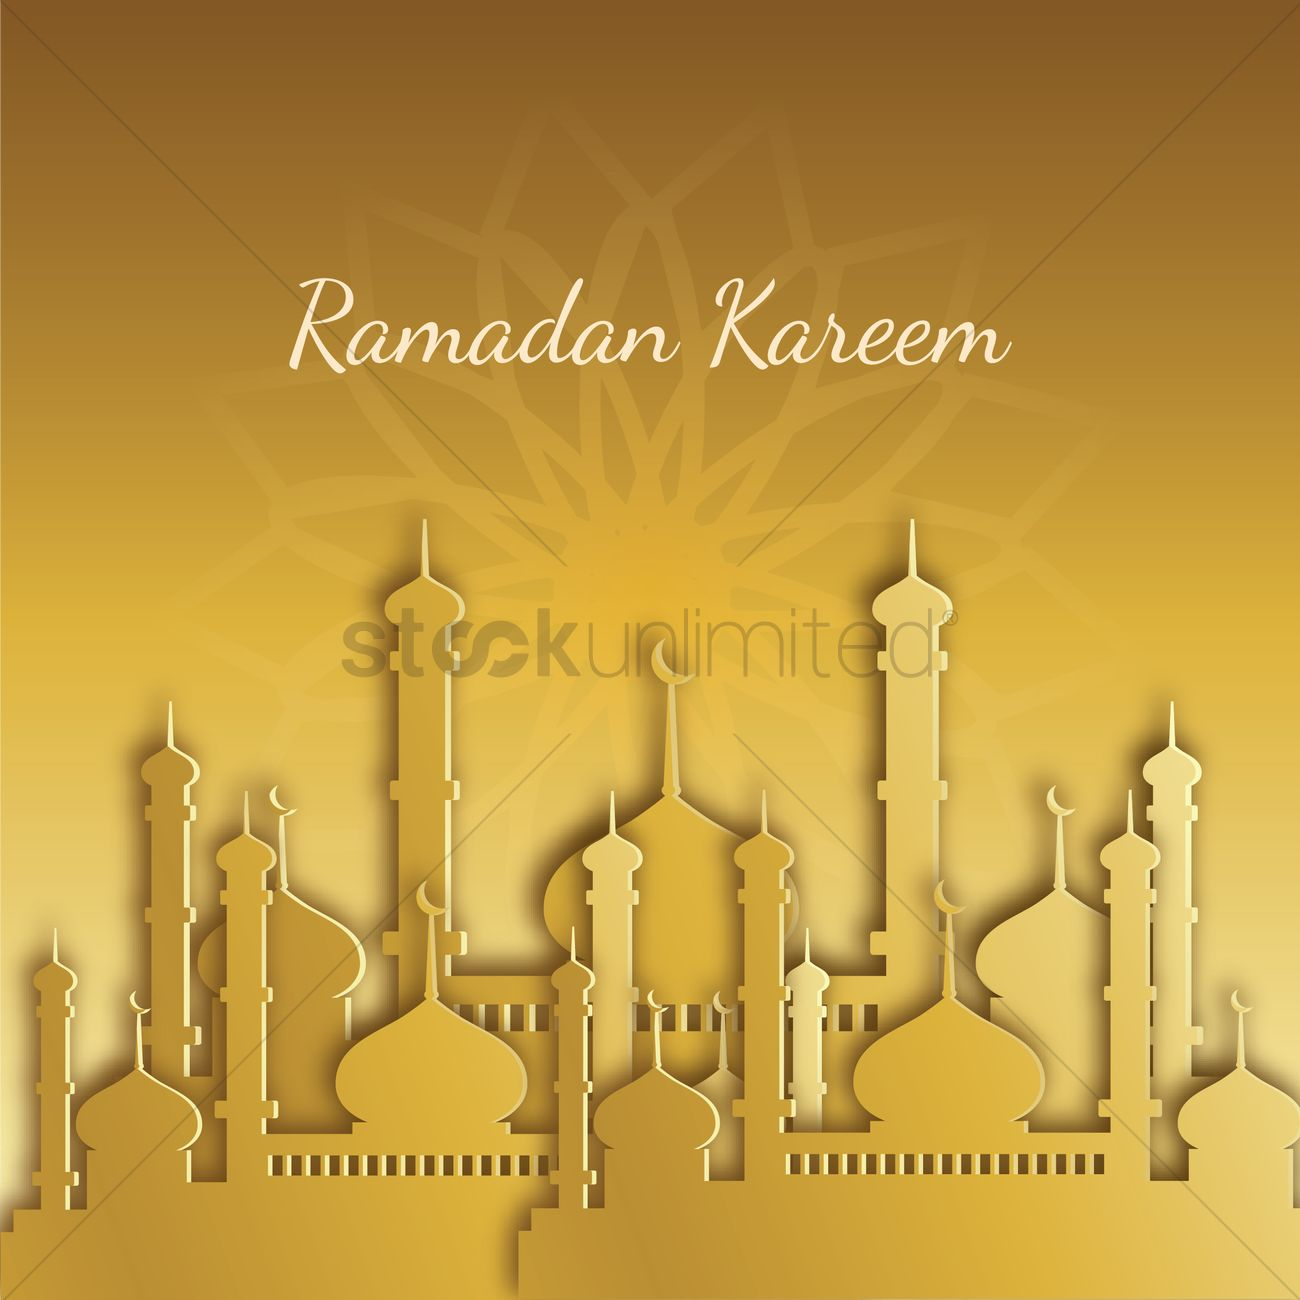 Ramadan Kareem Greeting Vector Image 1826937 Stockunlimited